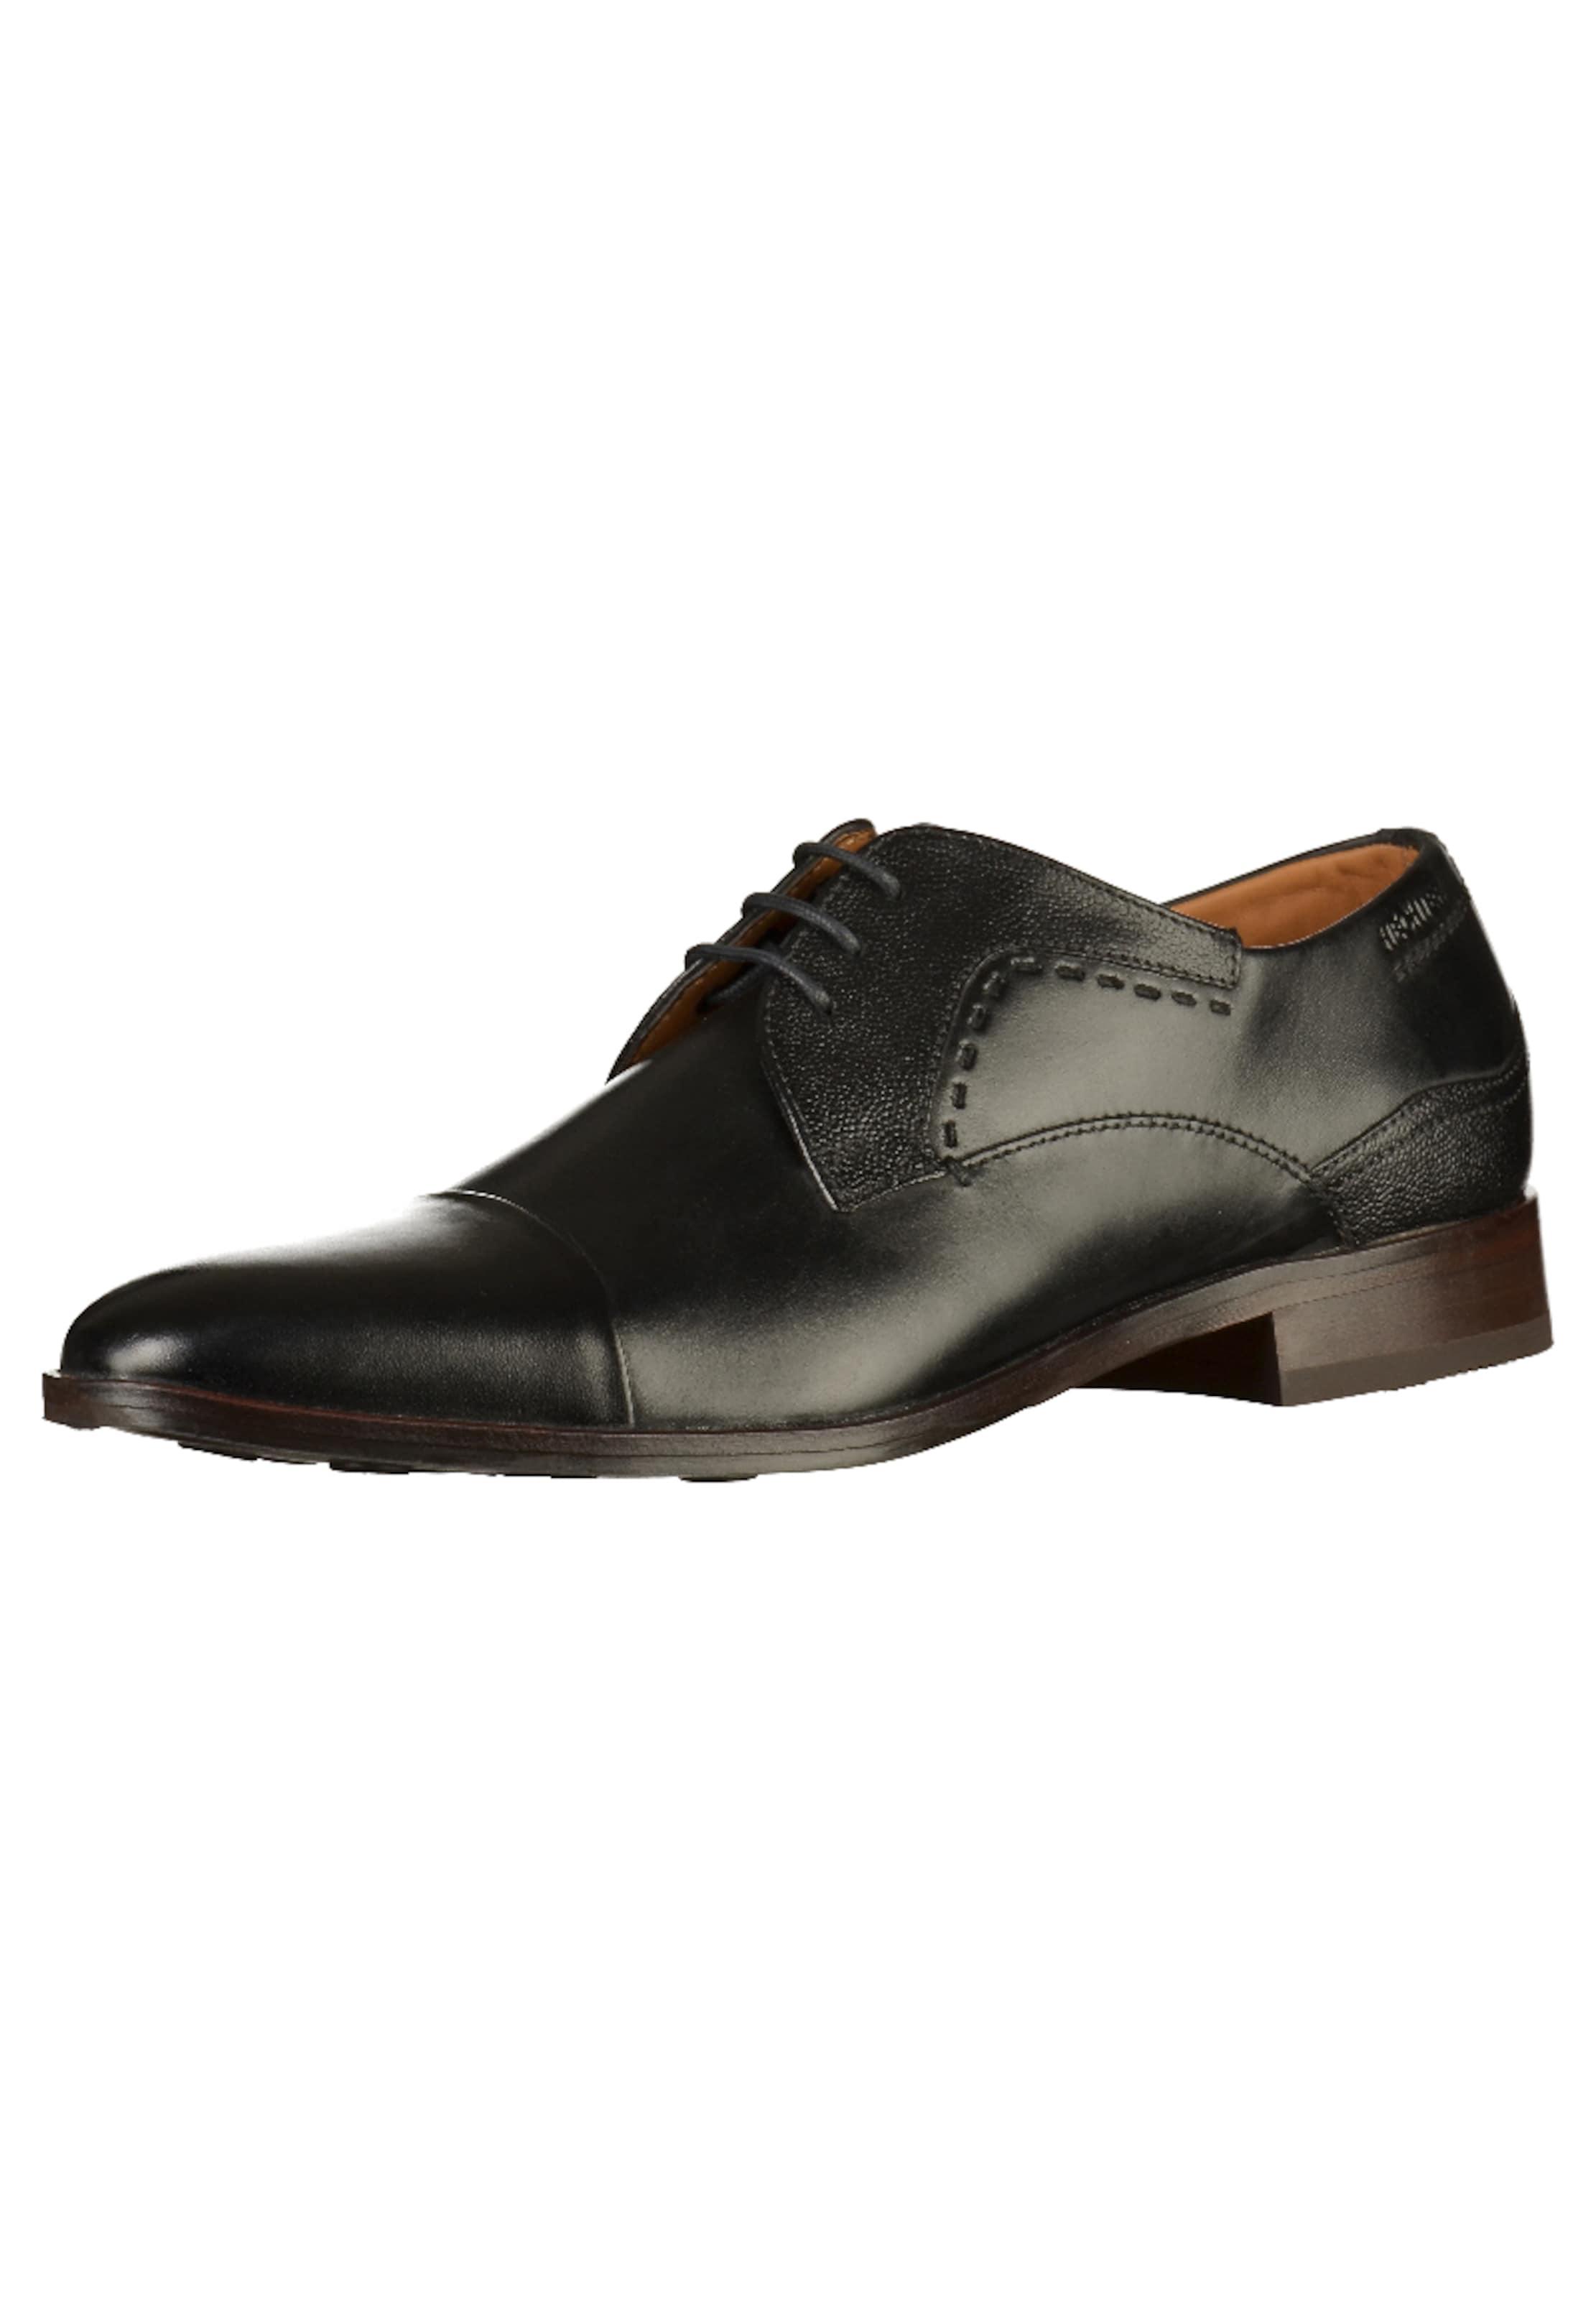 DANIEL HECHTER Businessschuhe Günstige und langlebige Schuhe